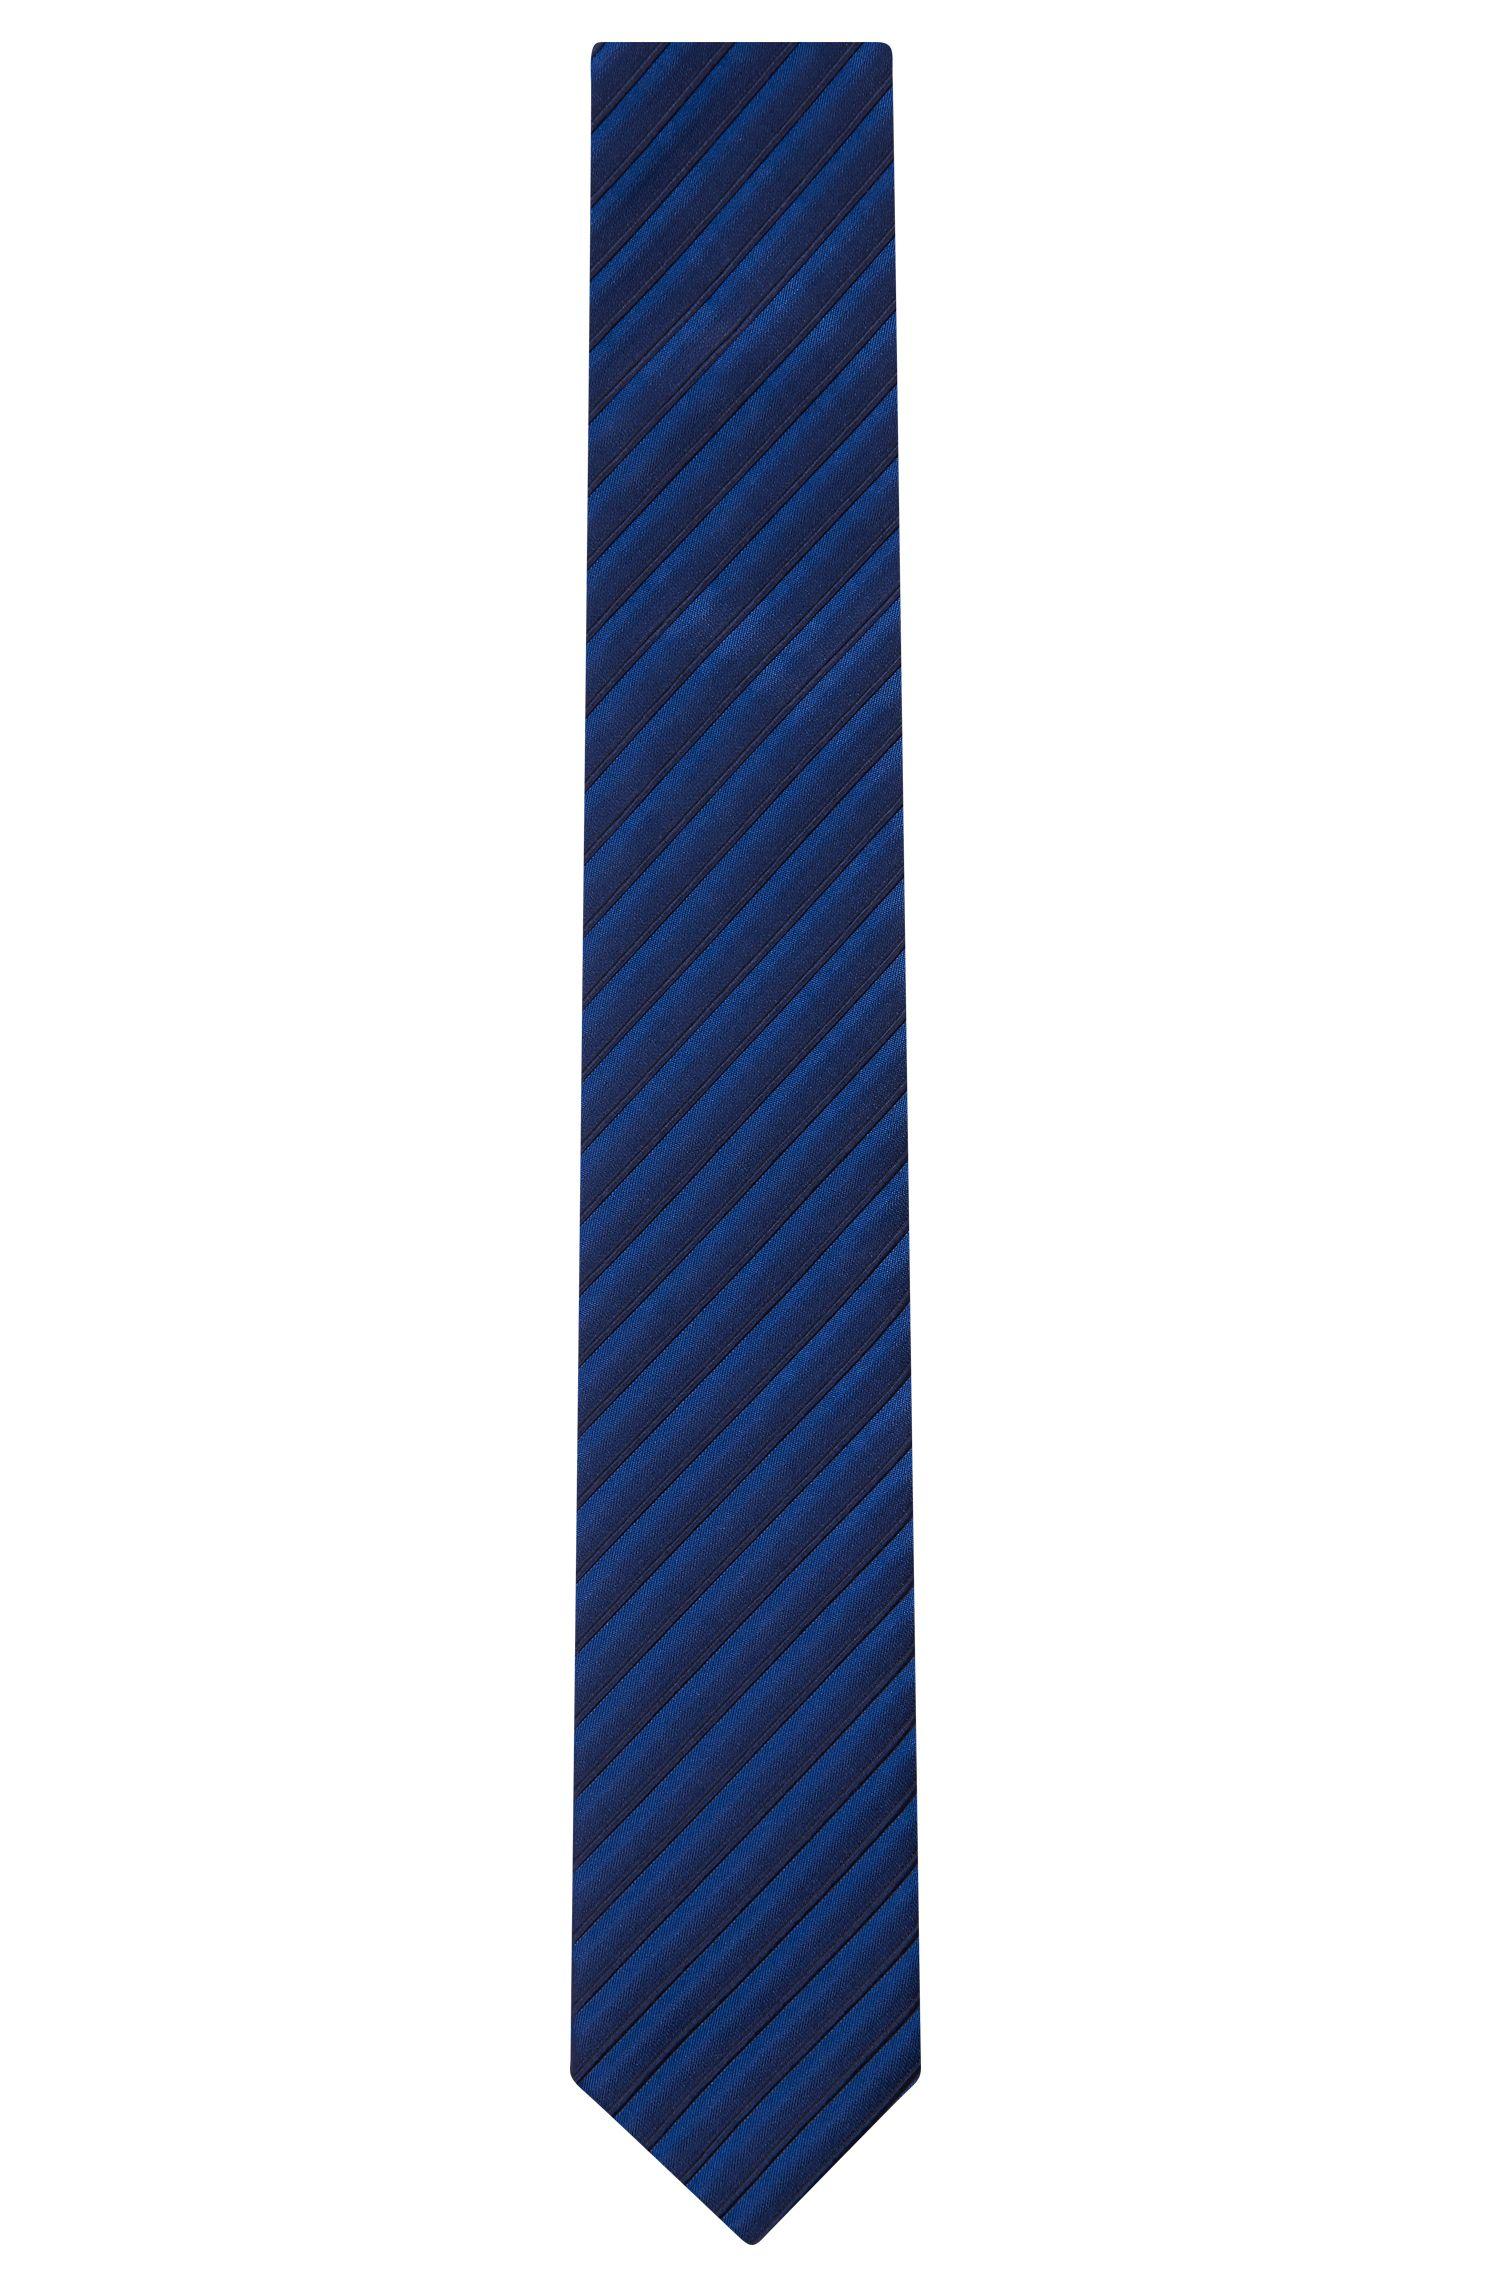 'Tie 6 cm'   Slim, Cotton Silk Tie